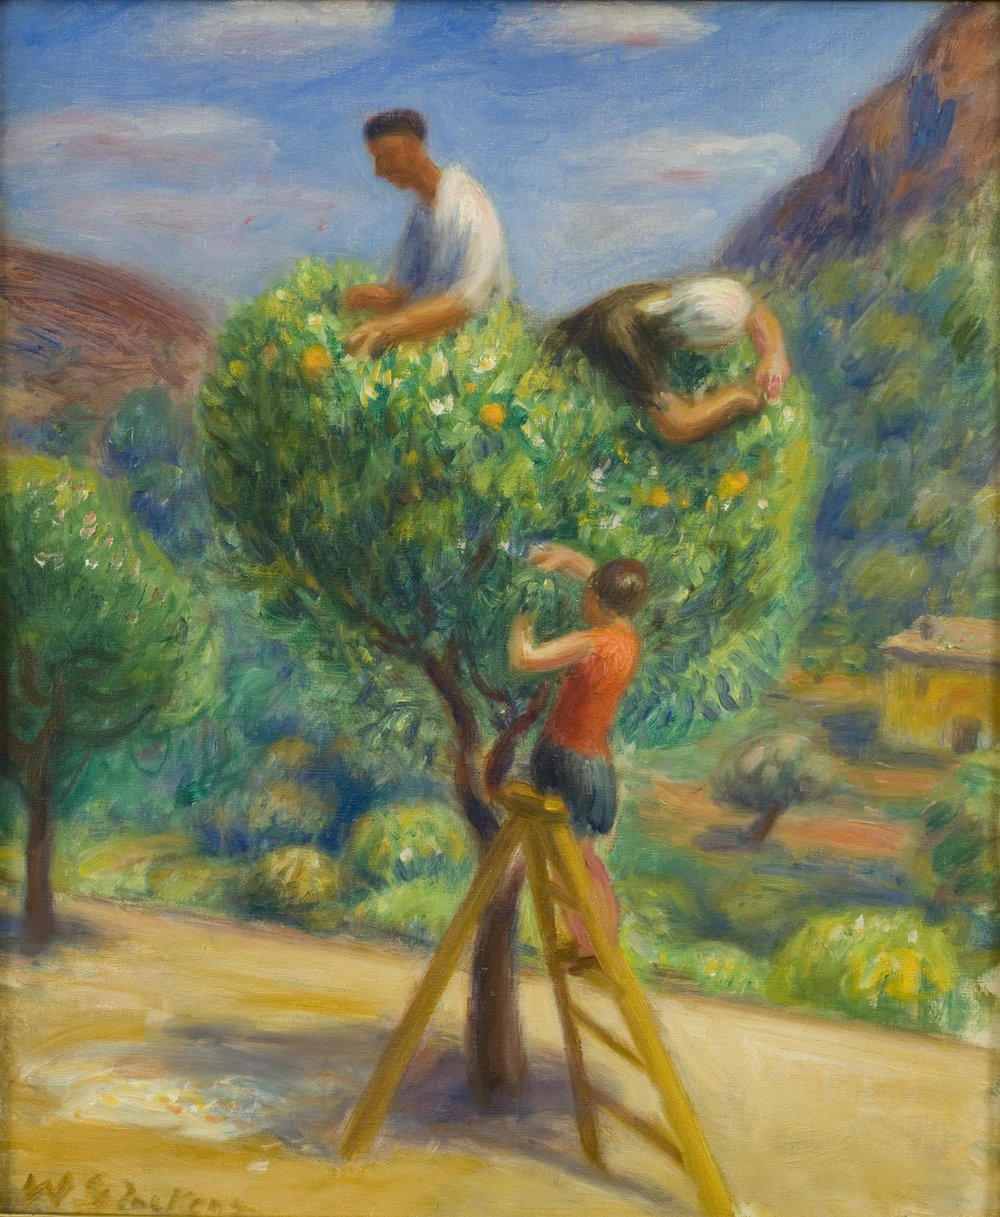 Glackens, Picking Fruit